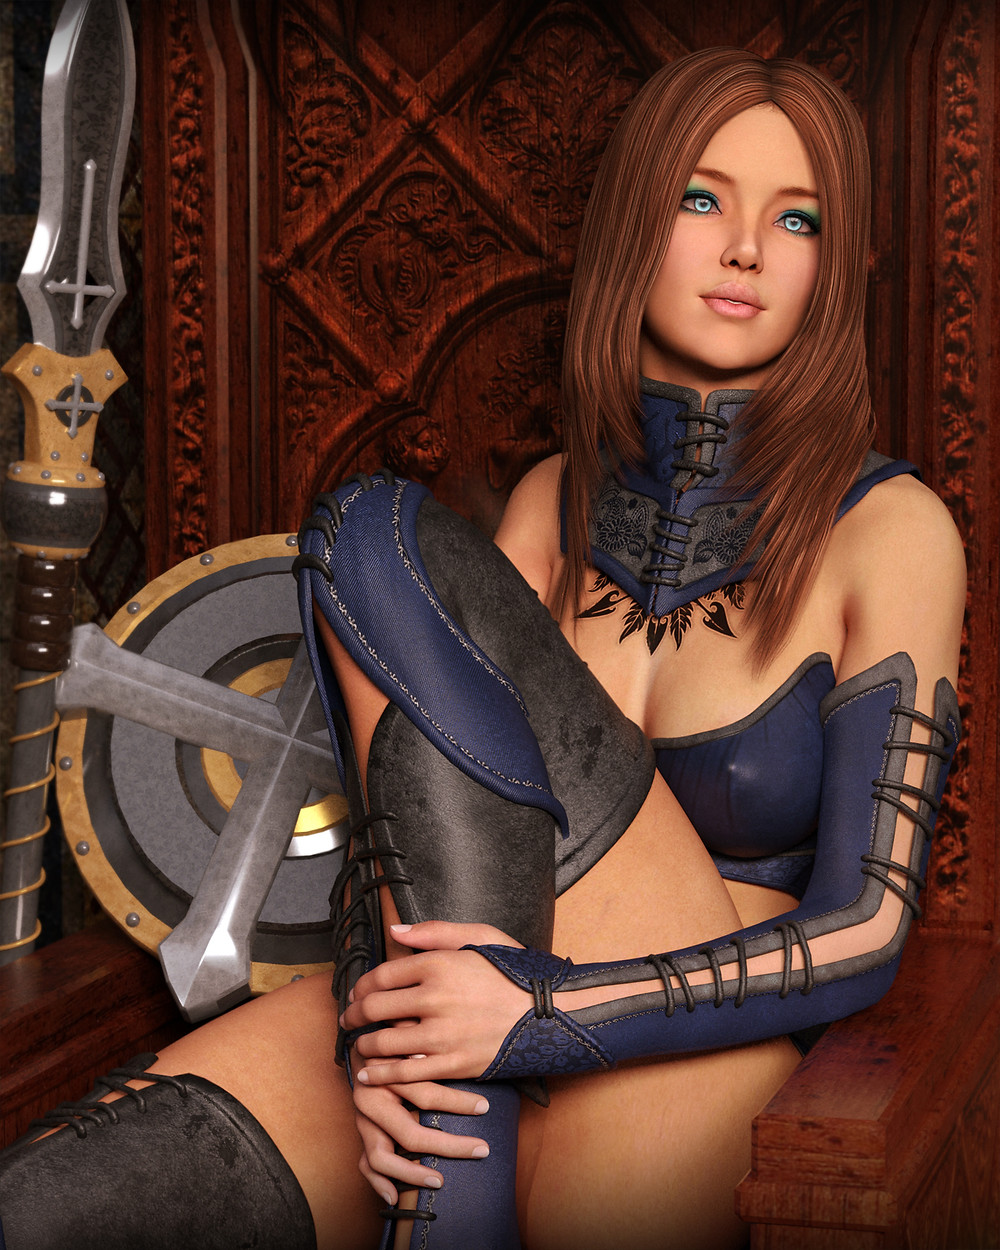 warriorelax1300.jpg